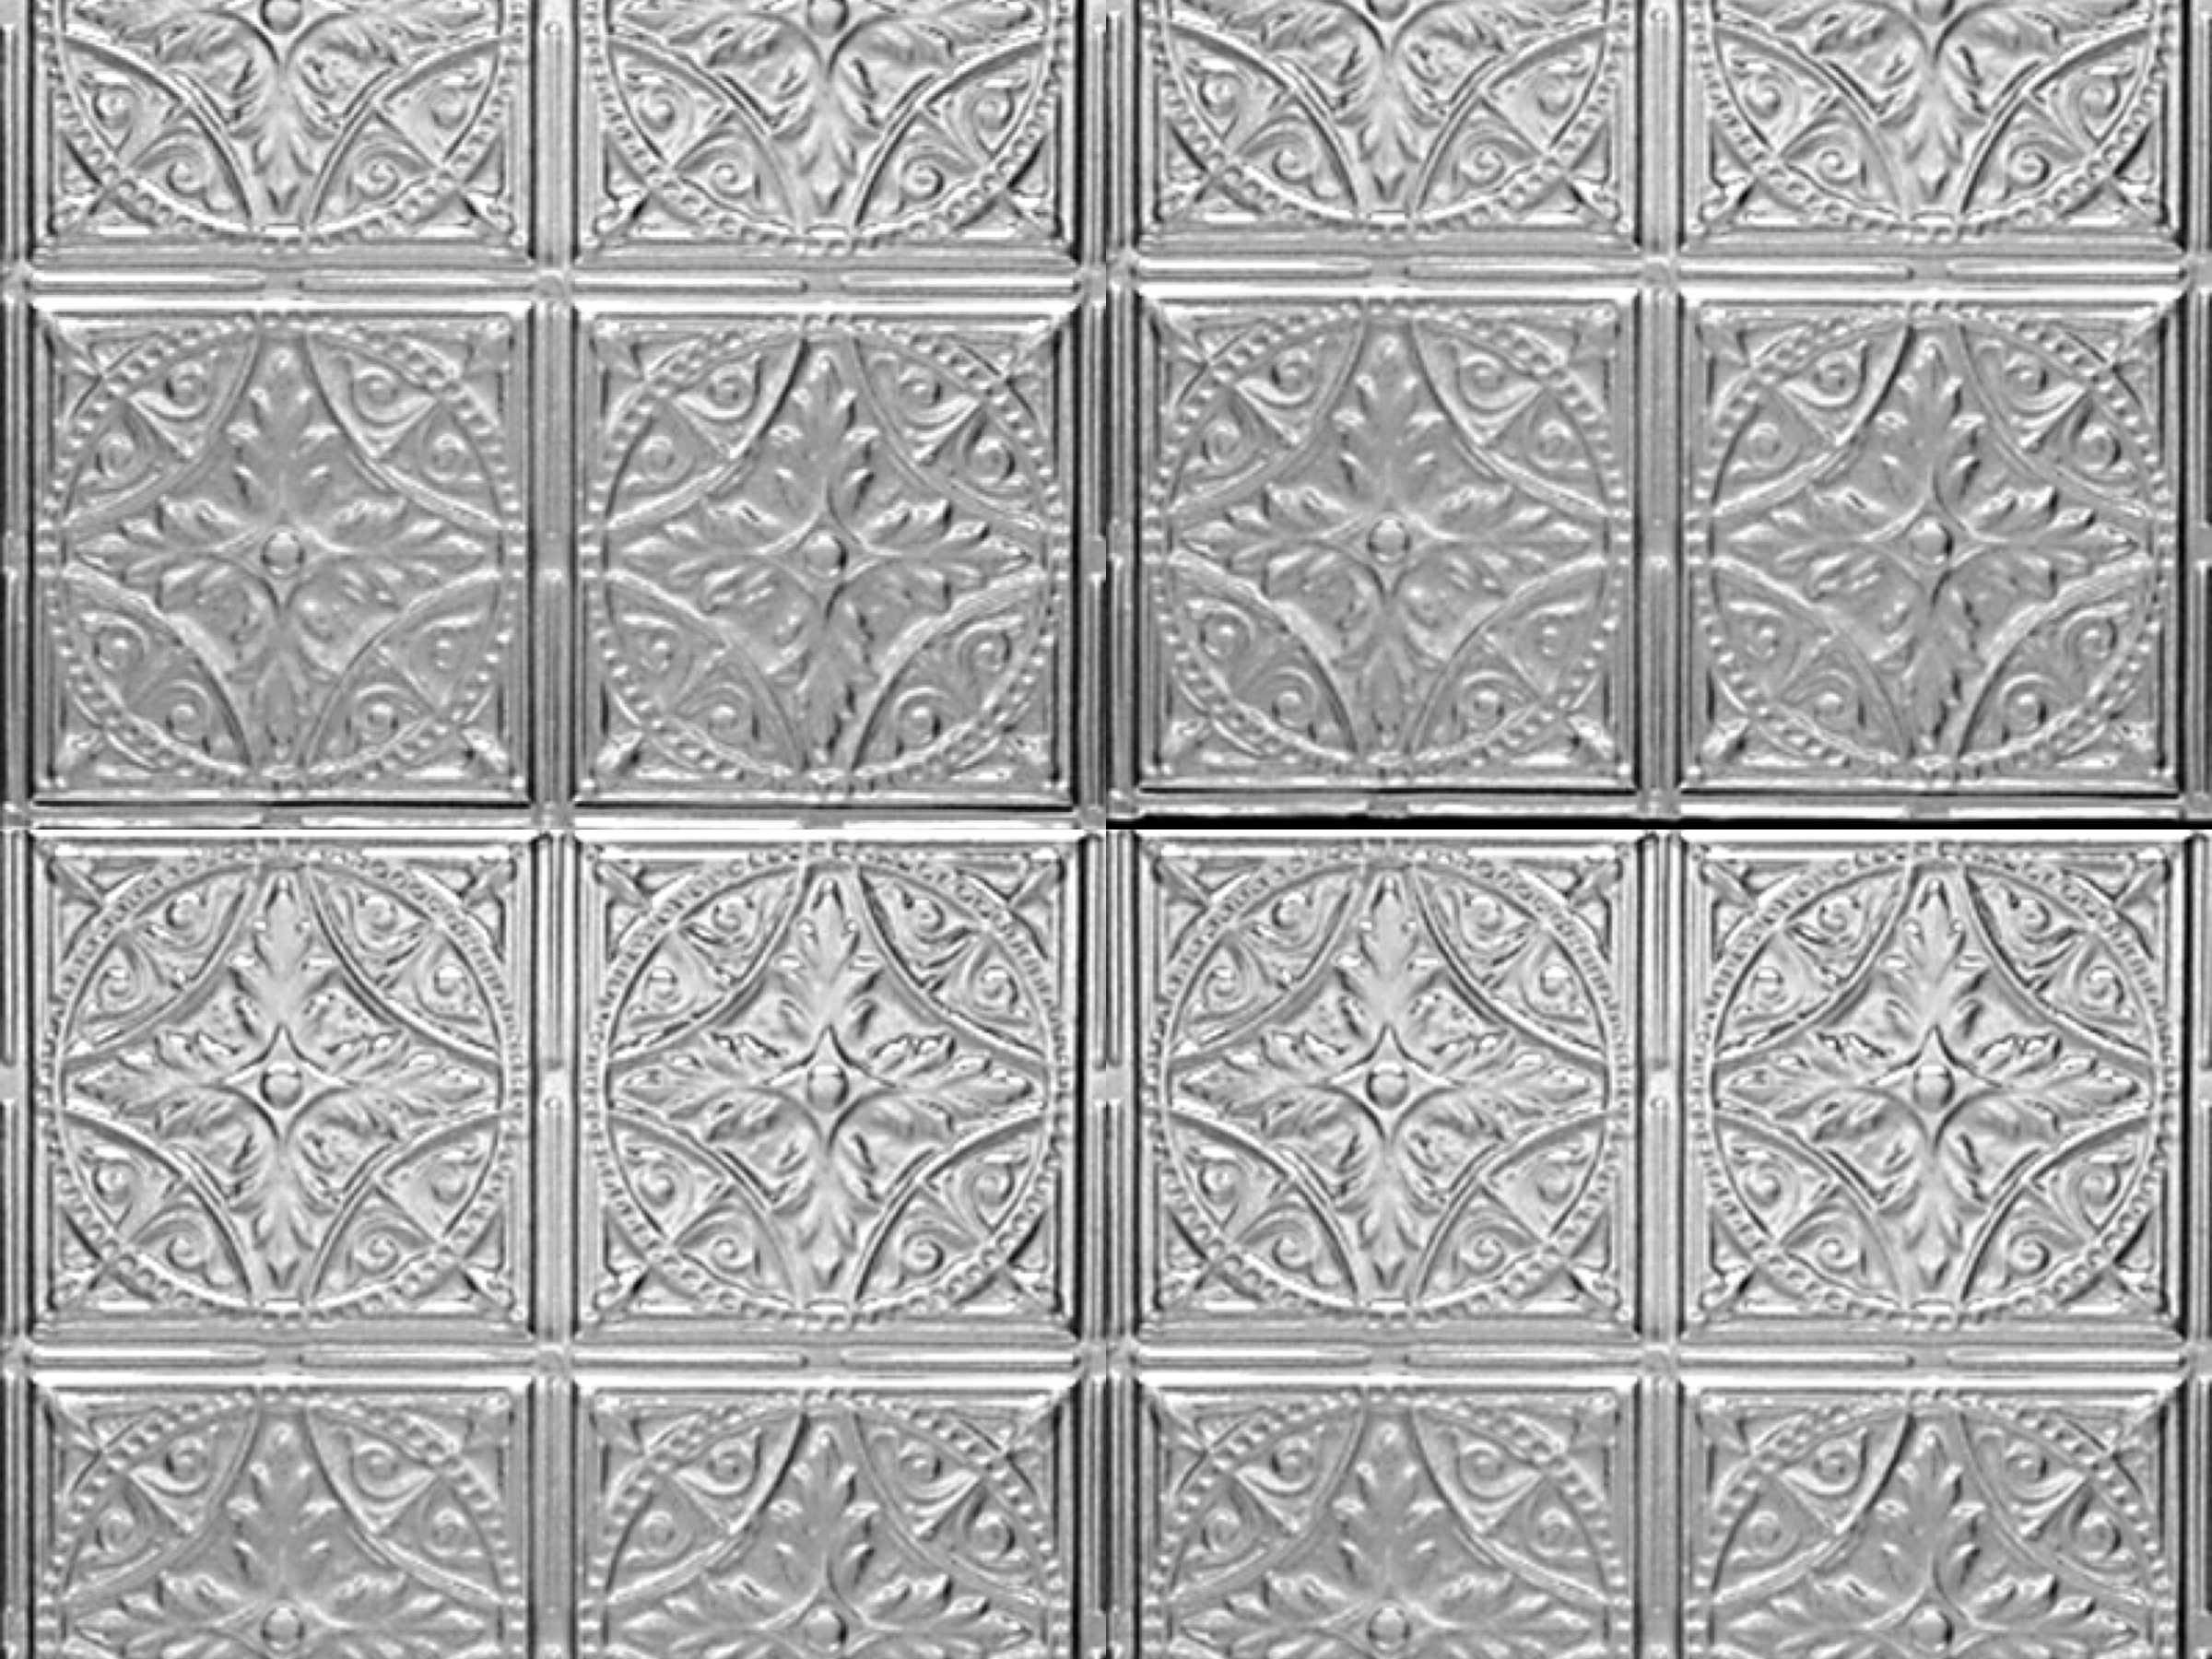 Tin Ceiling Tile Classic CompassTin Ceiling Tile Classic Compass